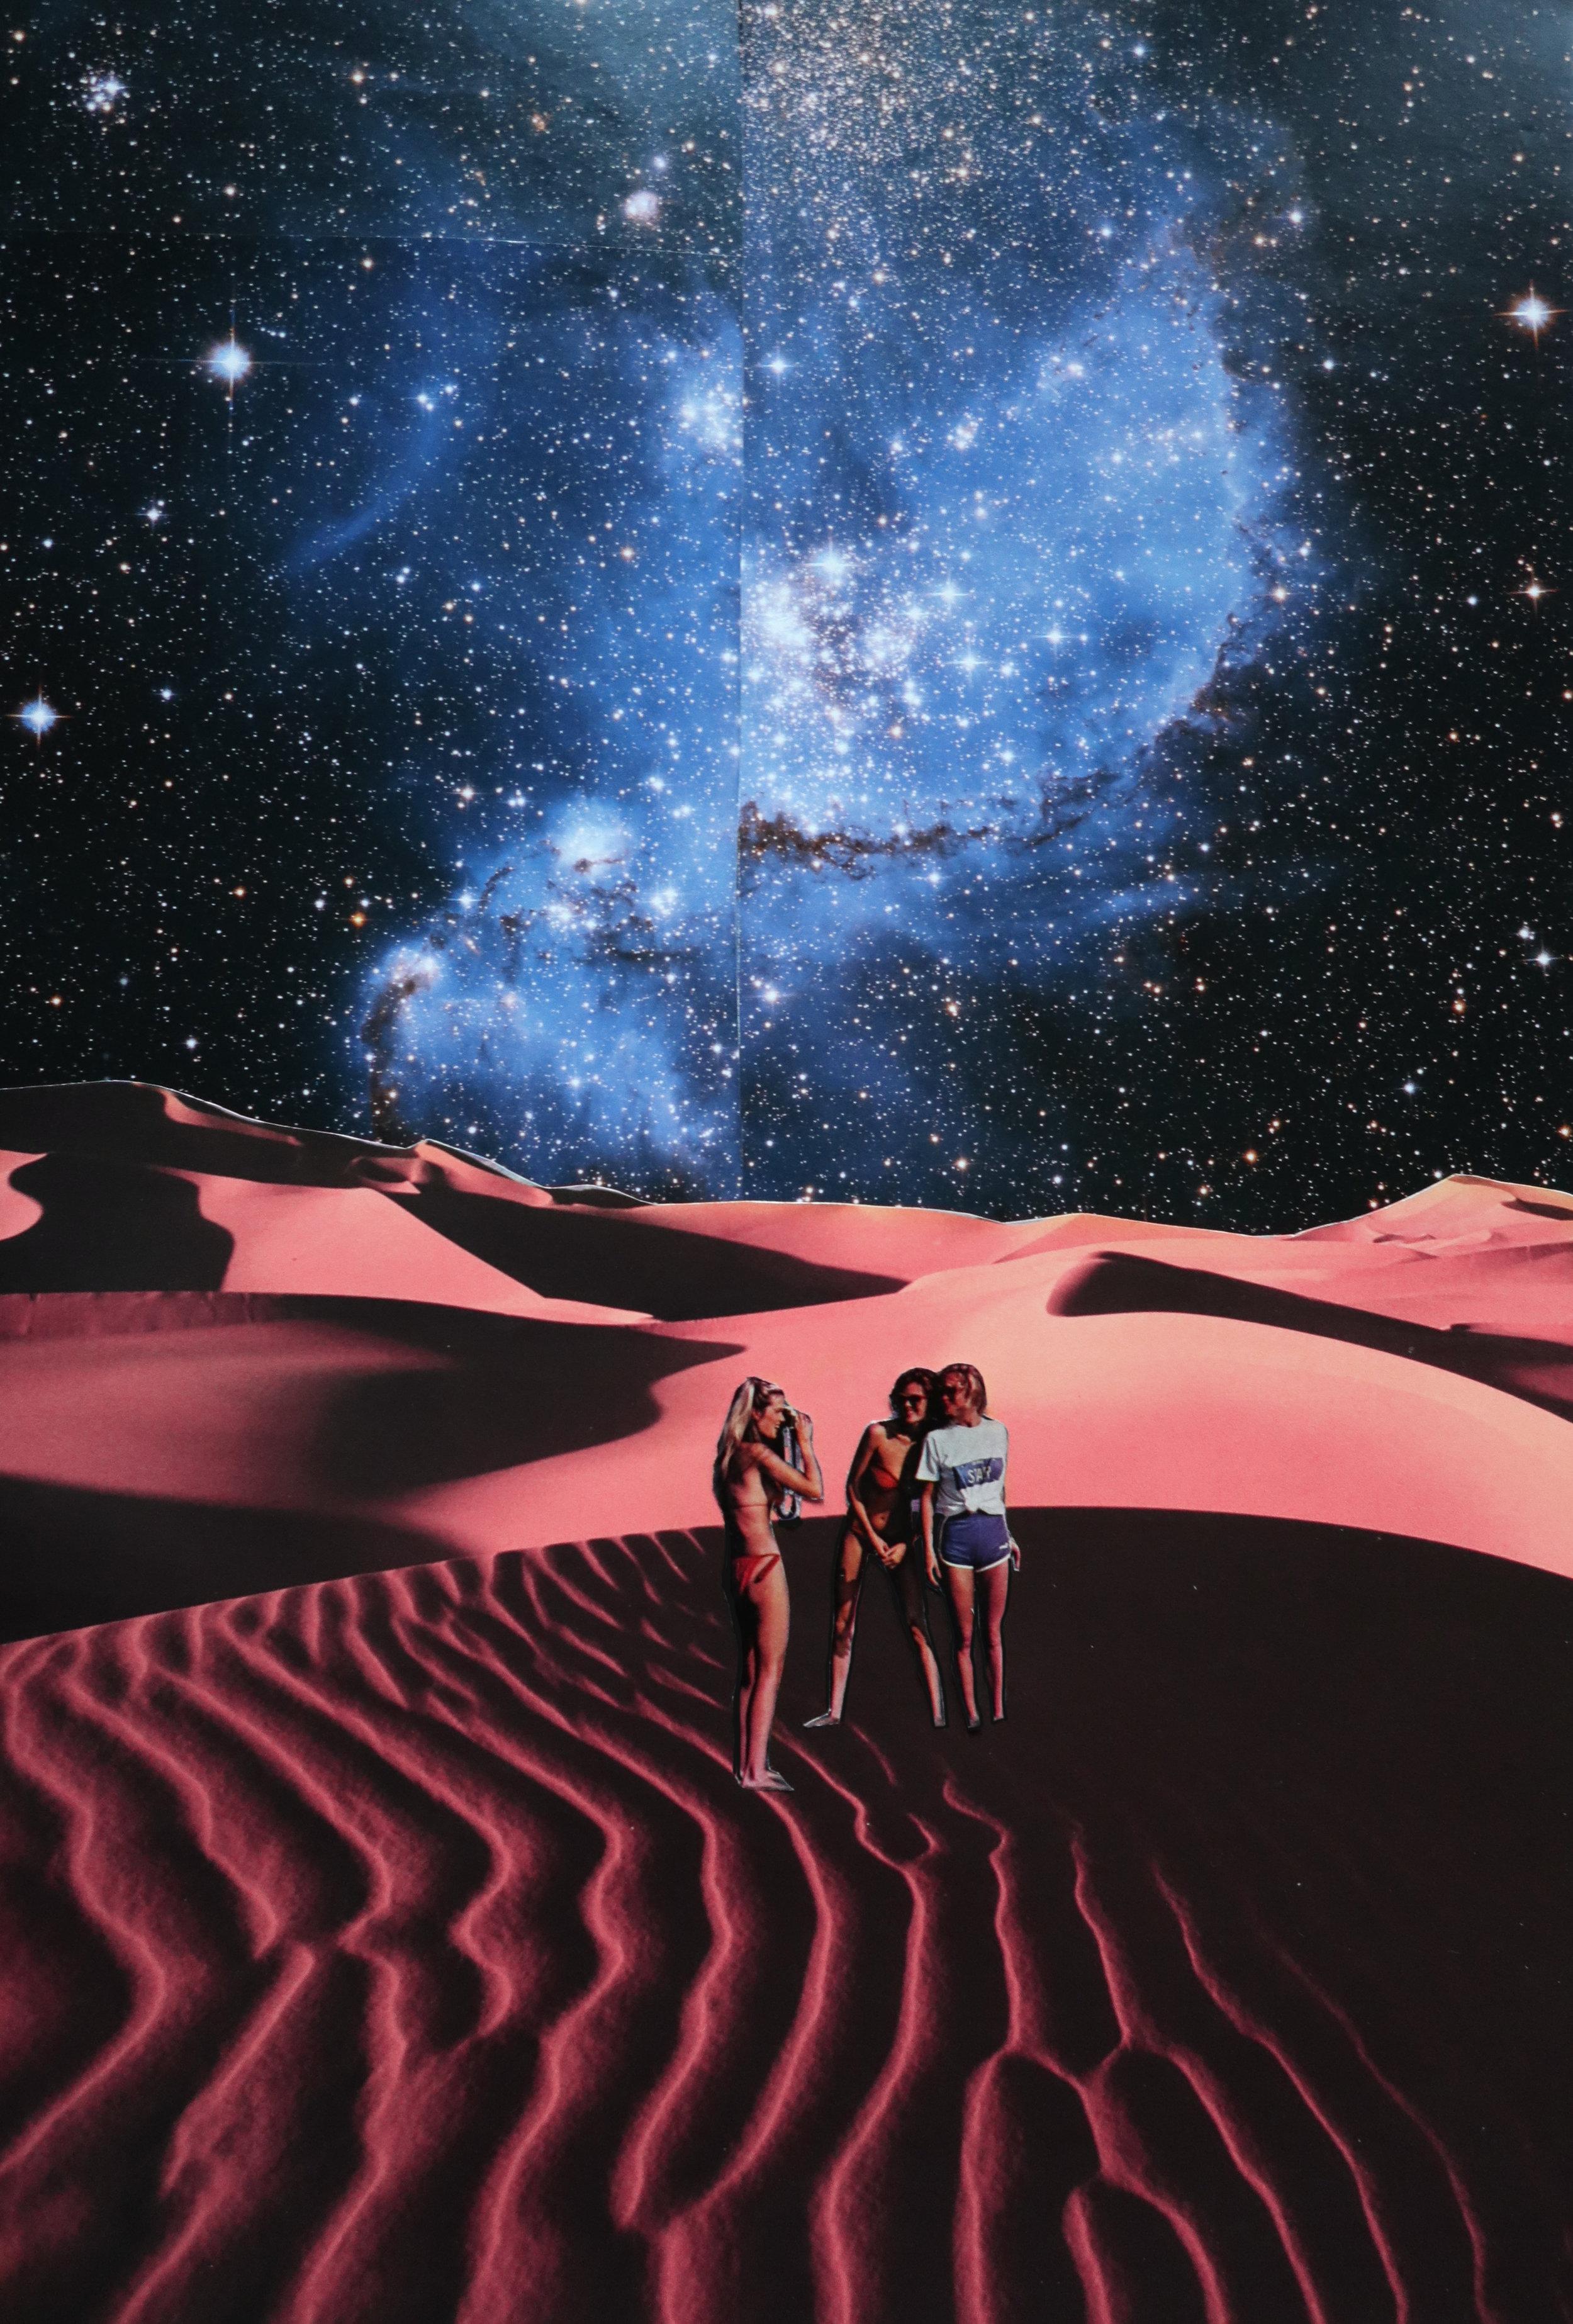 Space Touristas